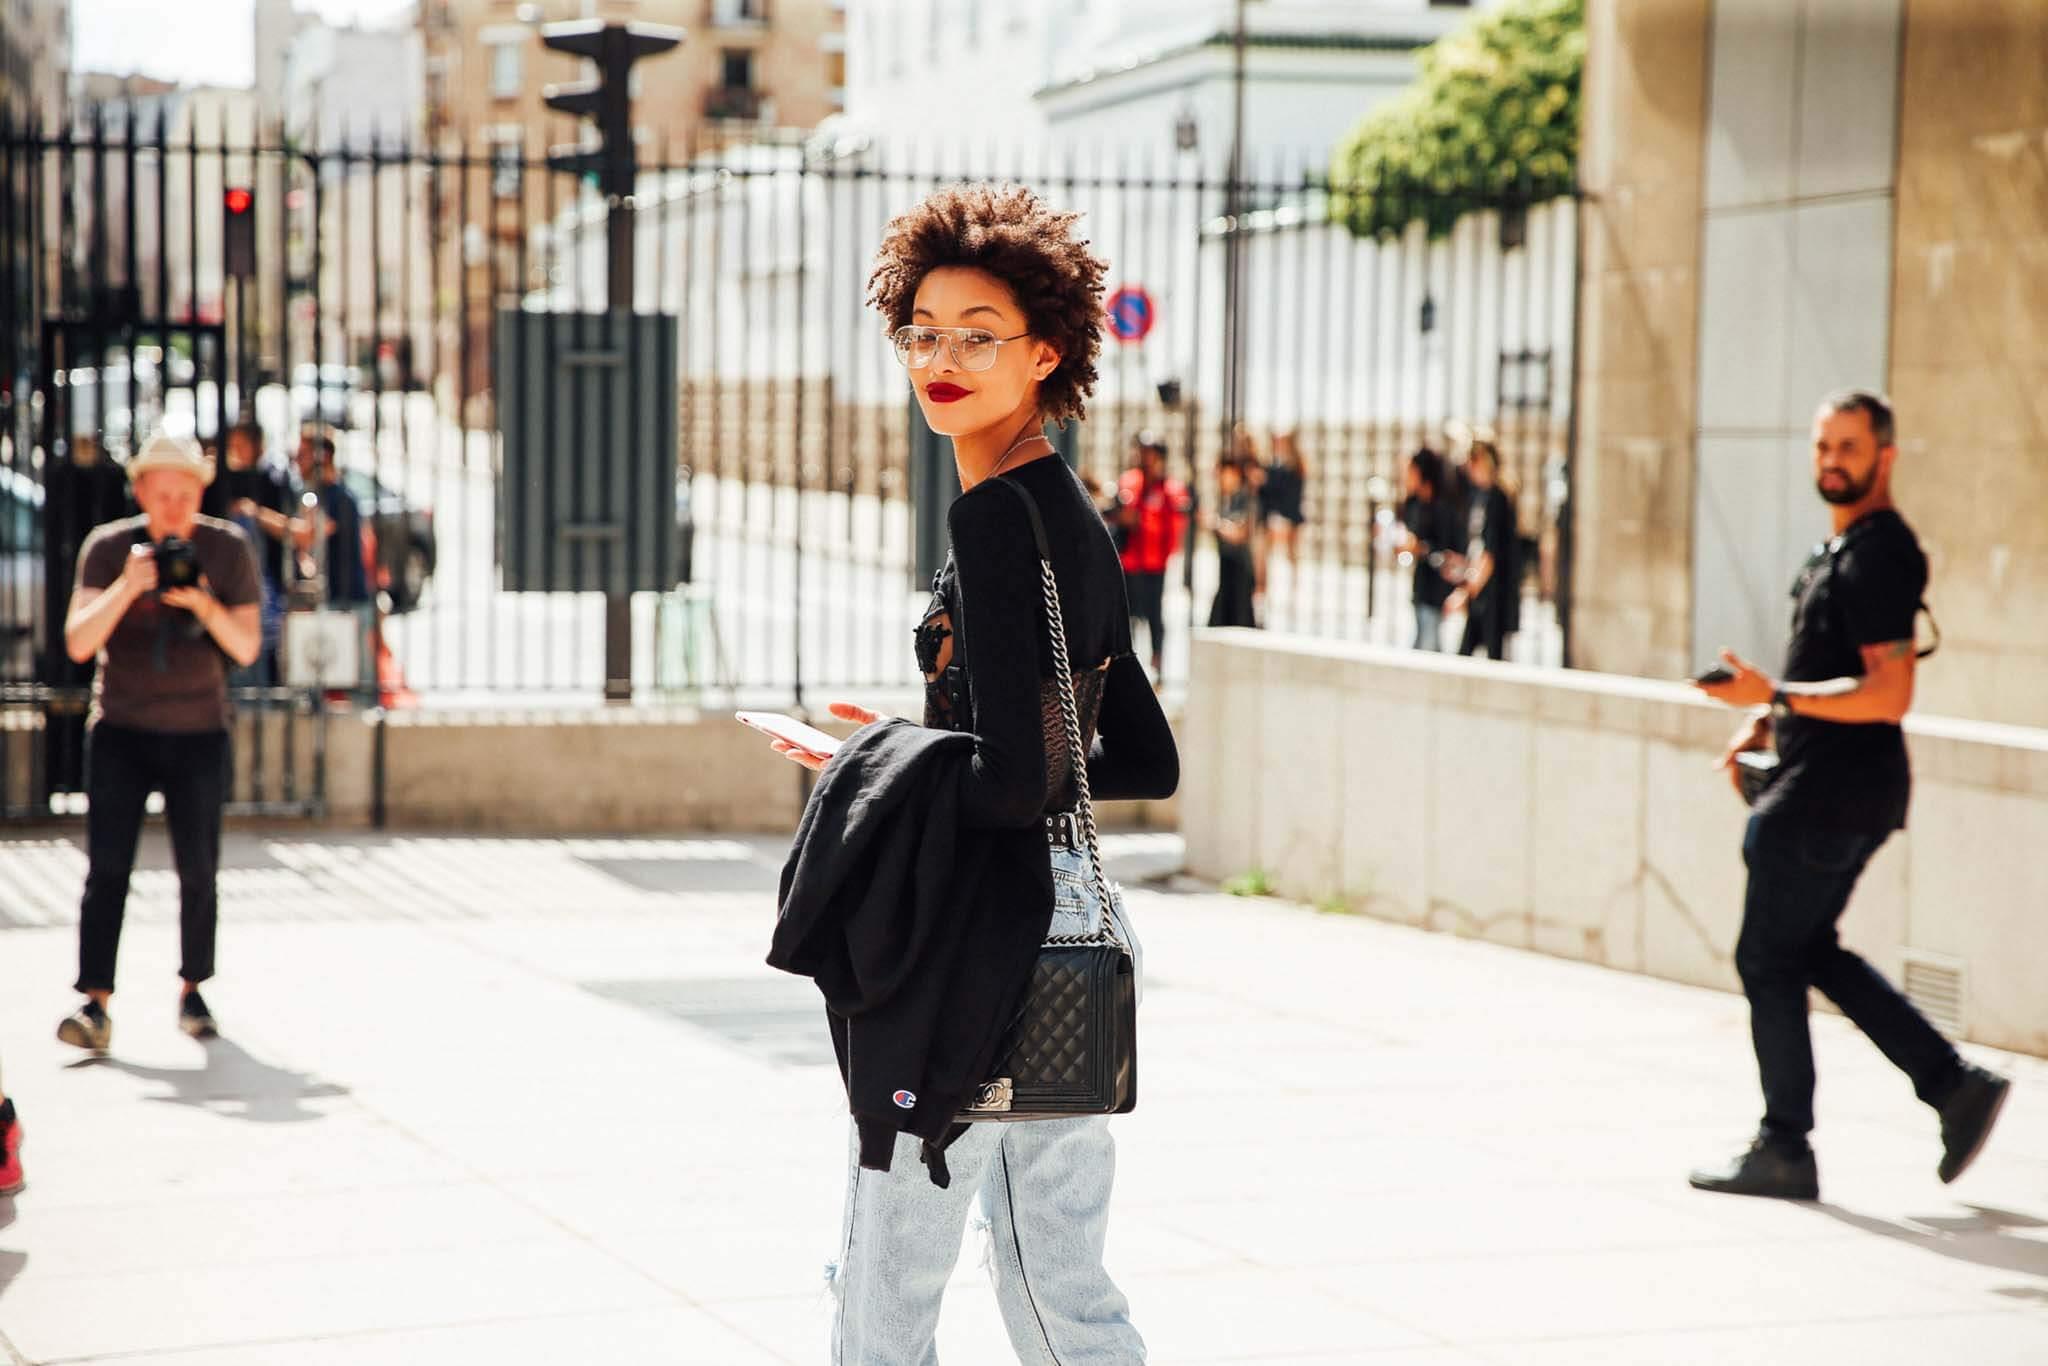 paris street style looks afro